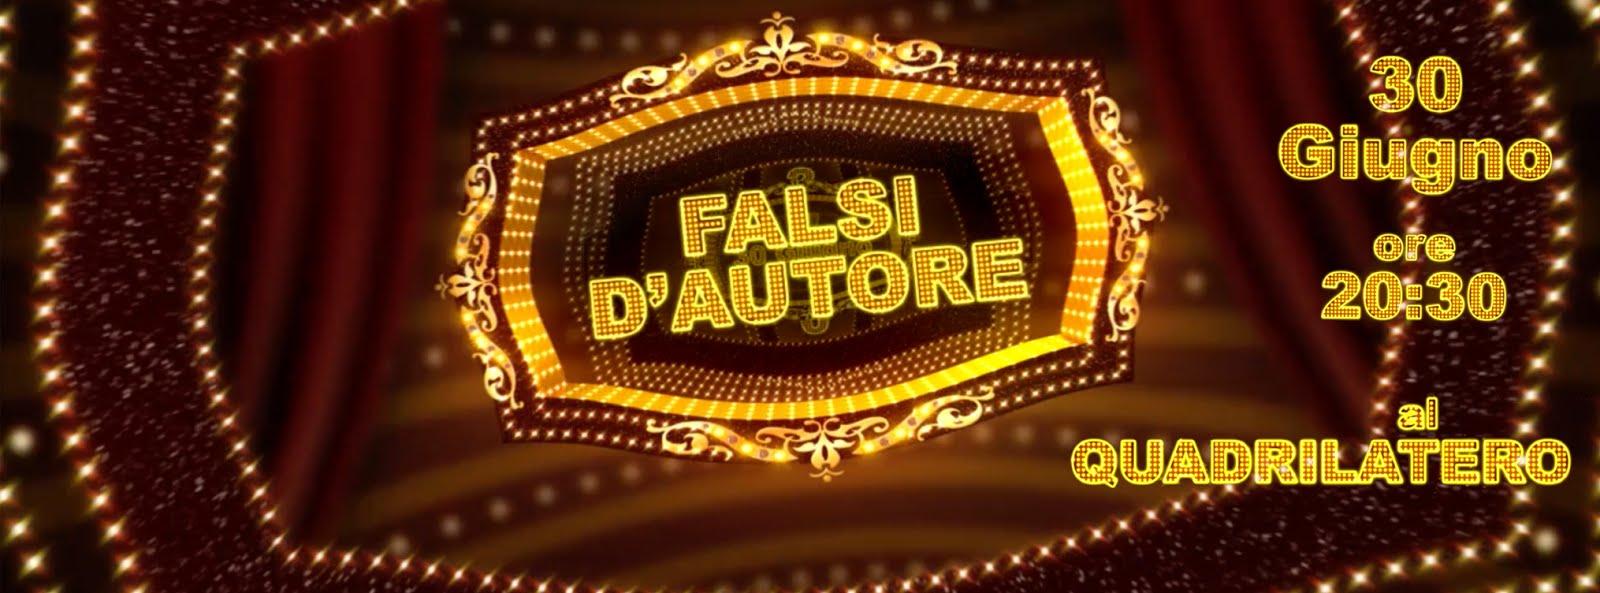 Promo >>> Falsi D'autore // Quadrilatero